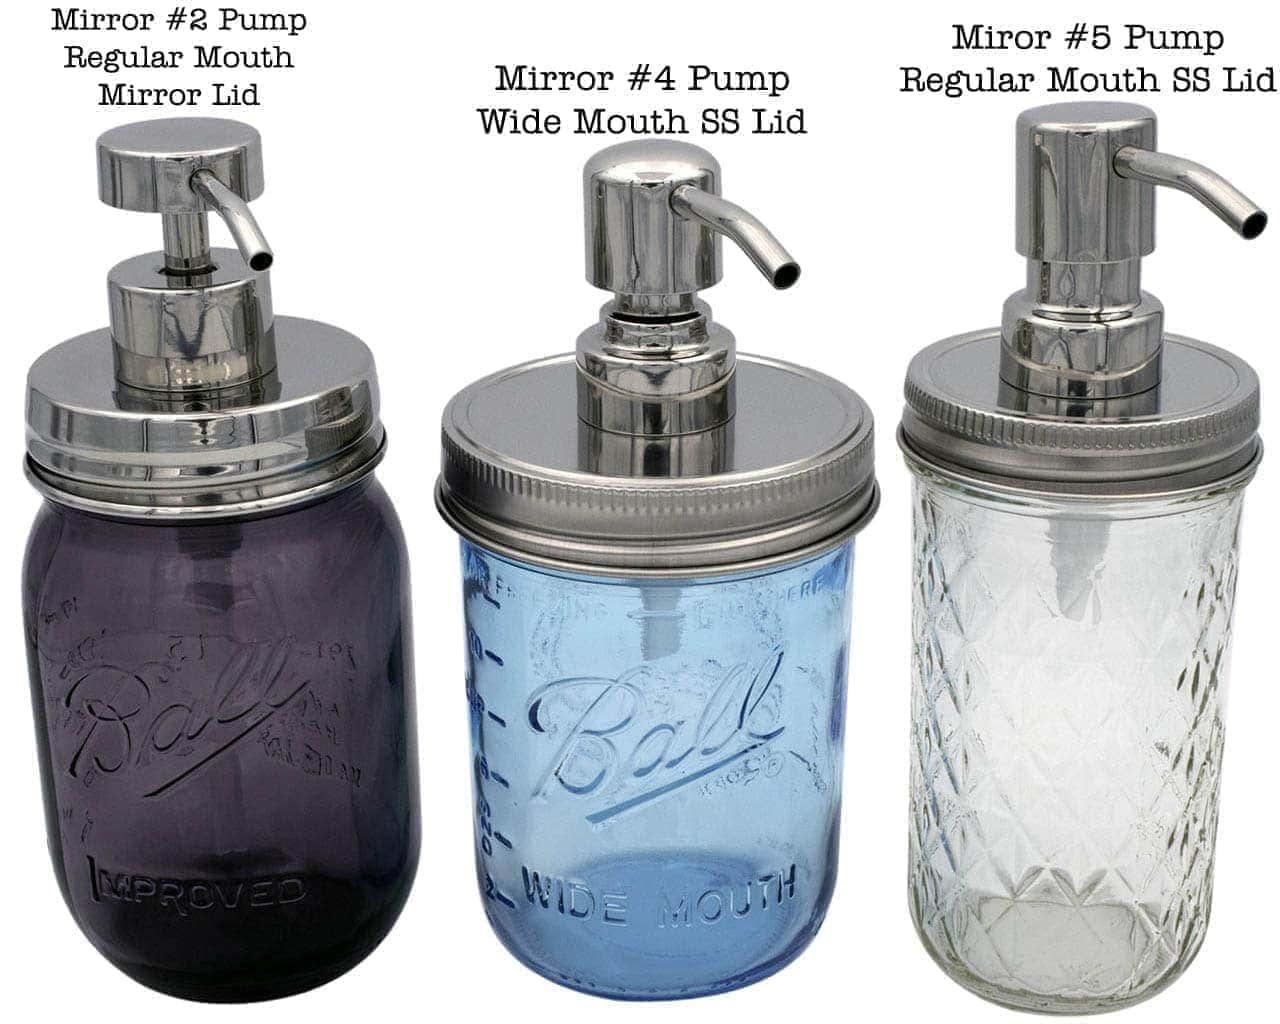 mason jar lifestyle rust proof soap lotion pump dispenser lid kit mirror chrome 2 4 5 regular wide mouth pint 16oz 12oz ball mason jars labelled